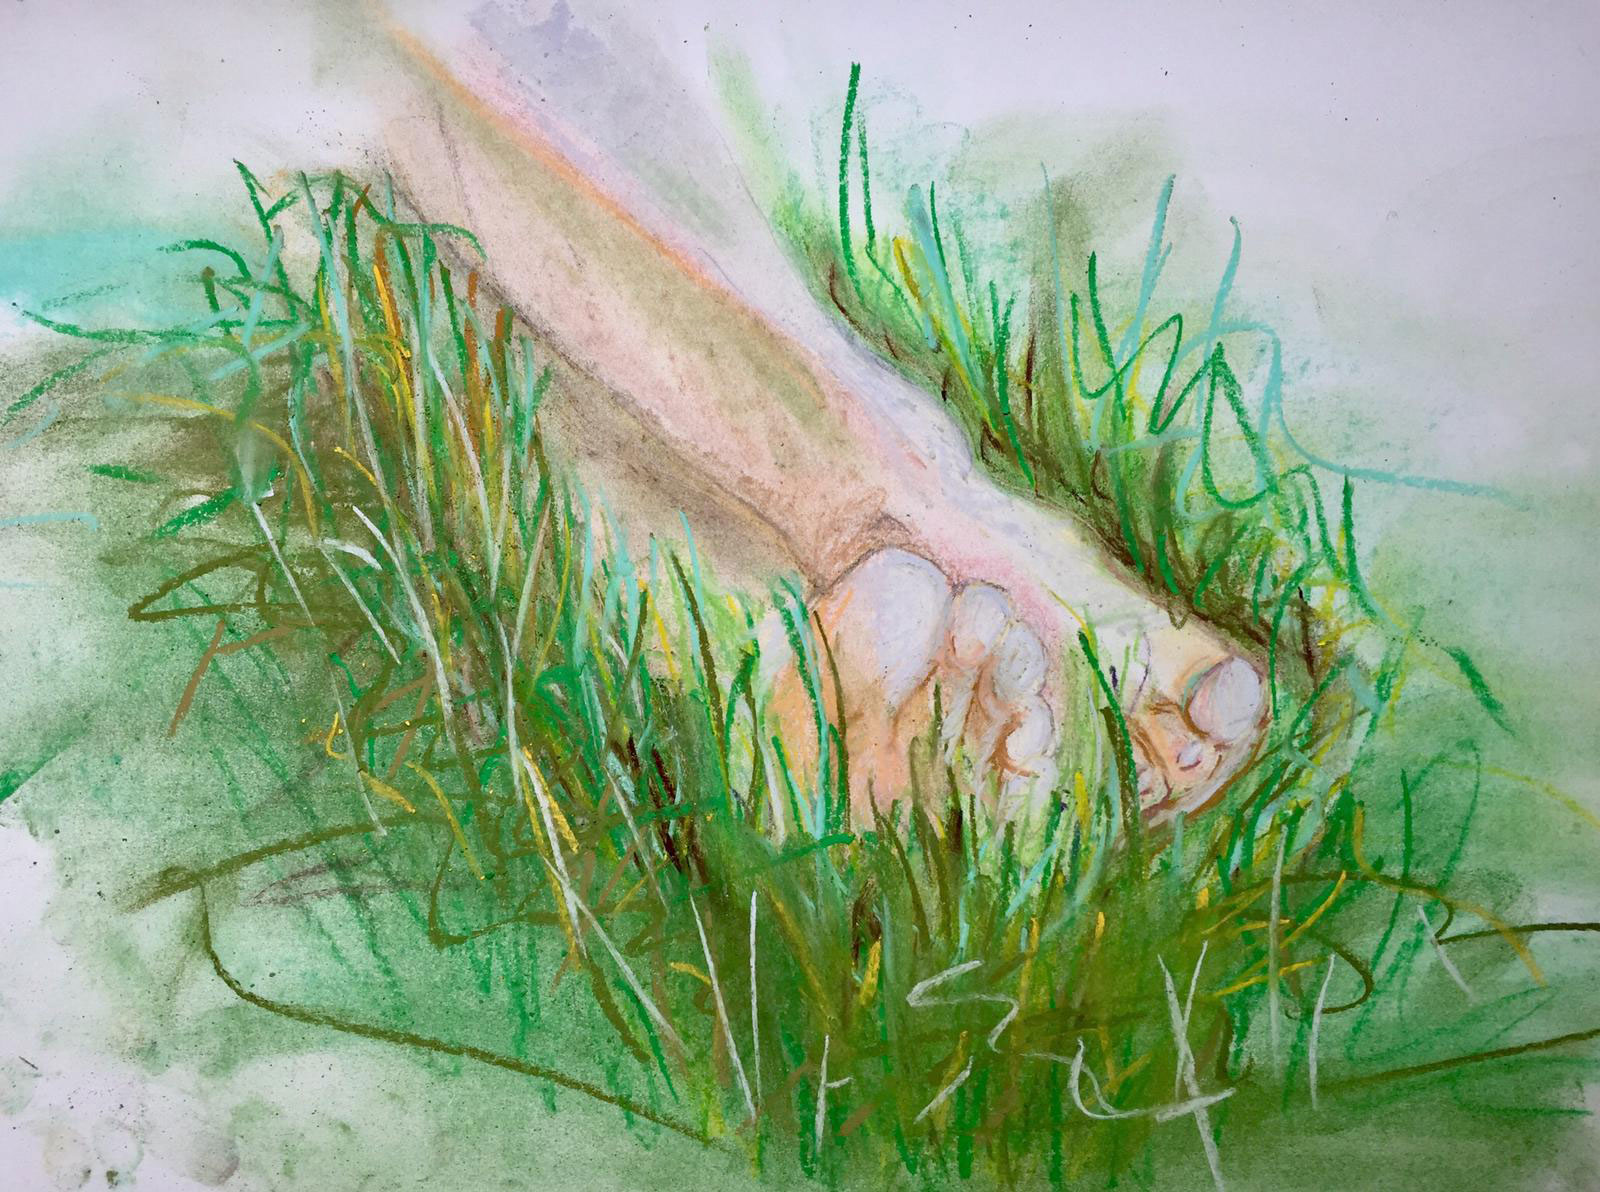 Anja zum Thema «Frühlingsgefühle»